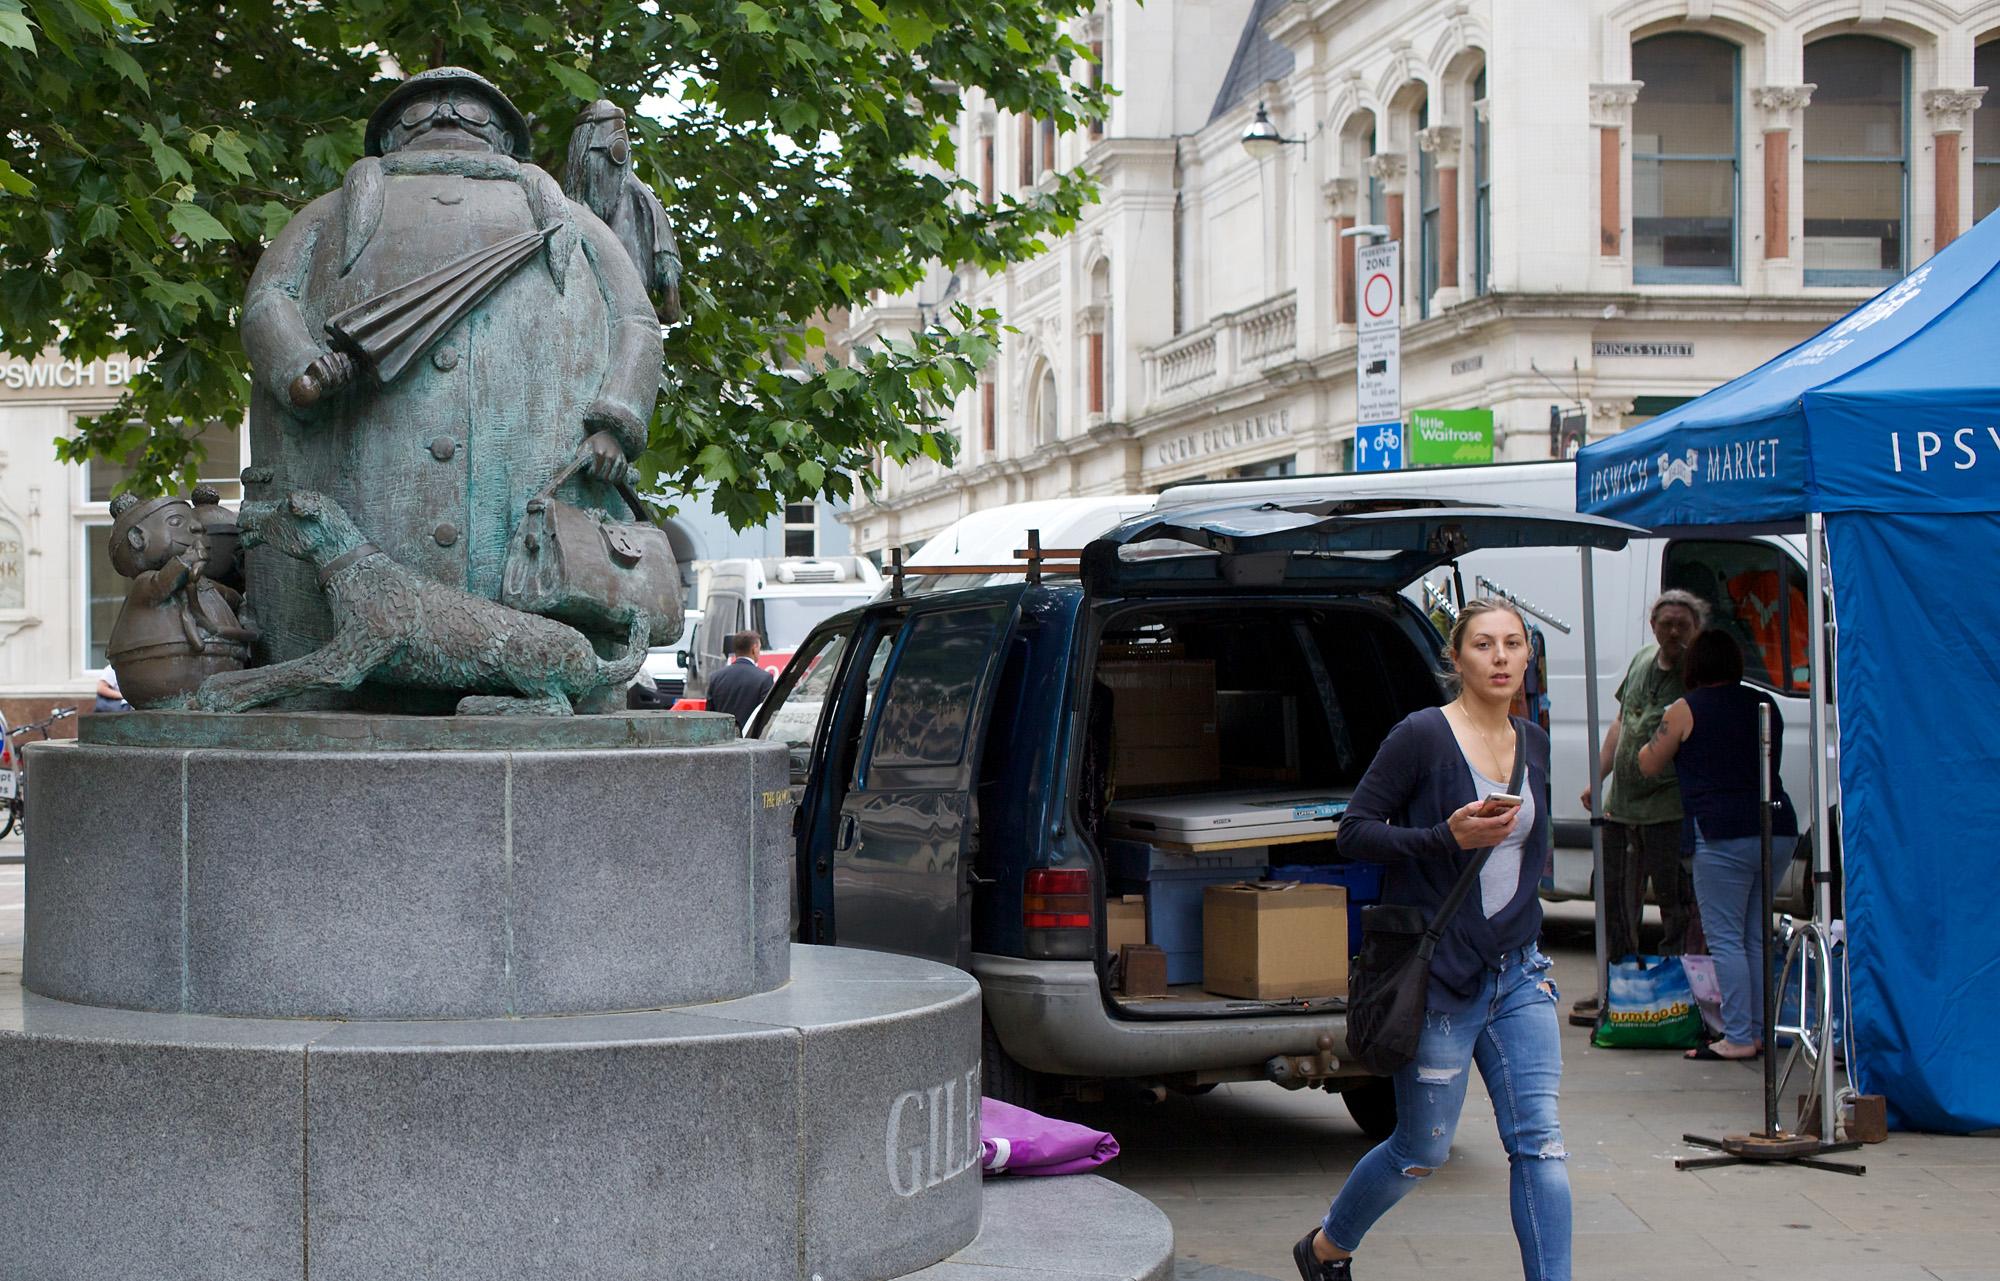 statue near market stalls